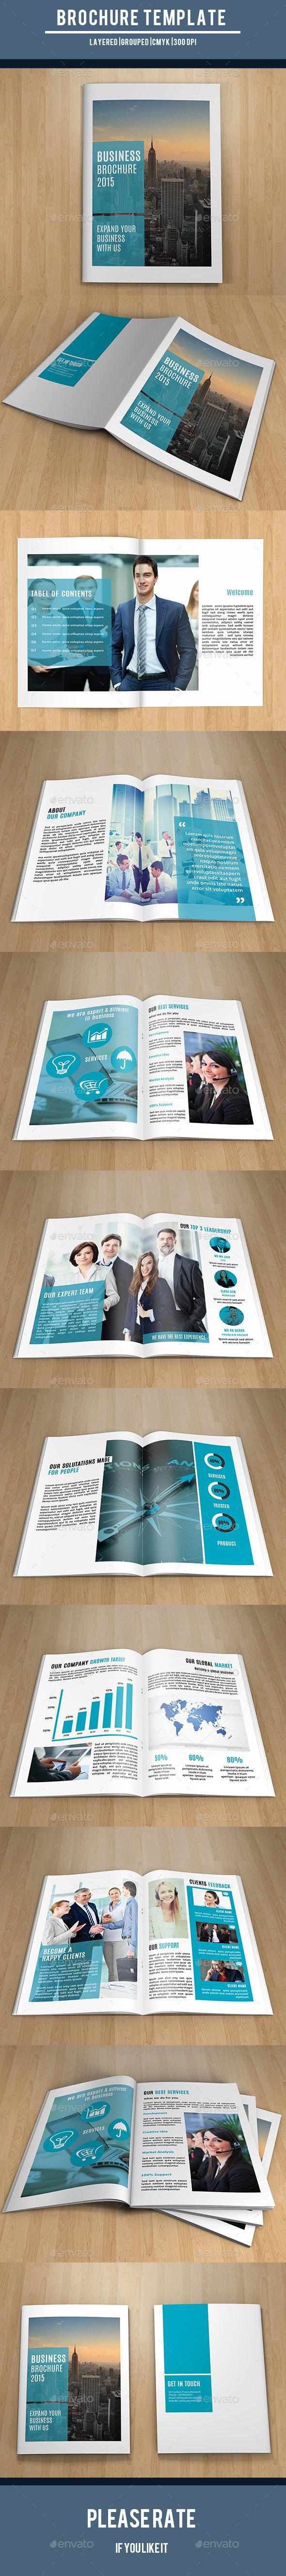 Corporate Brochure Template-V218 - Catalogs Brochures